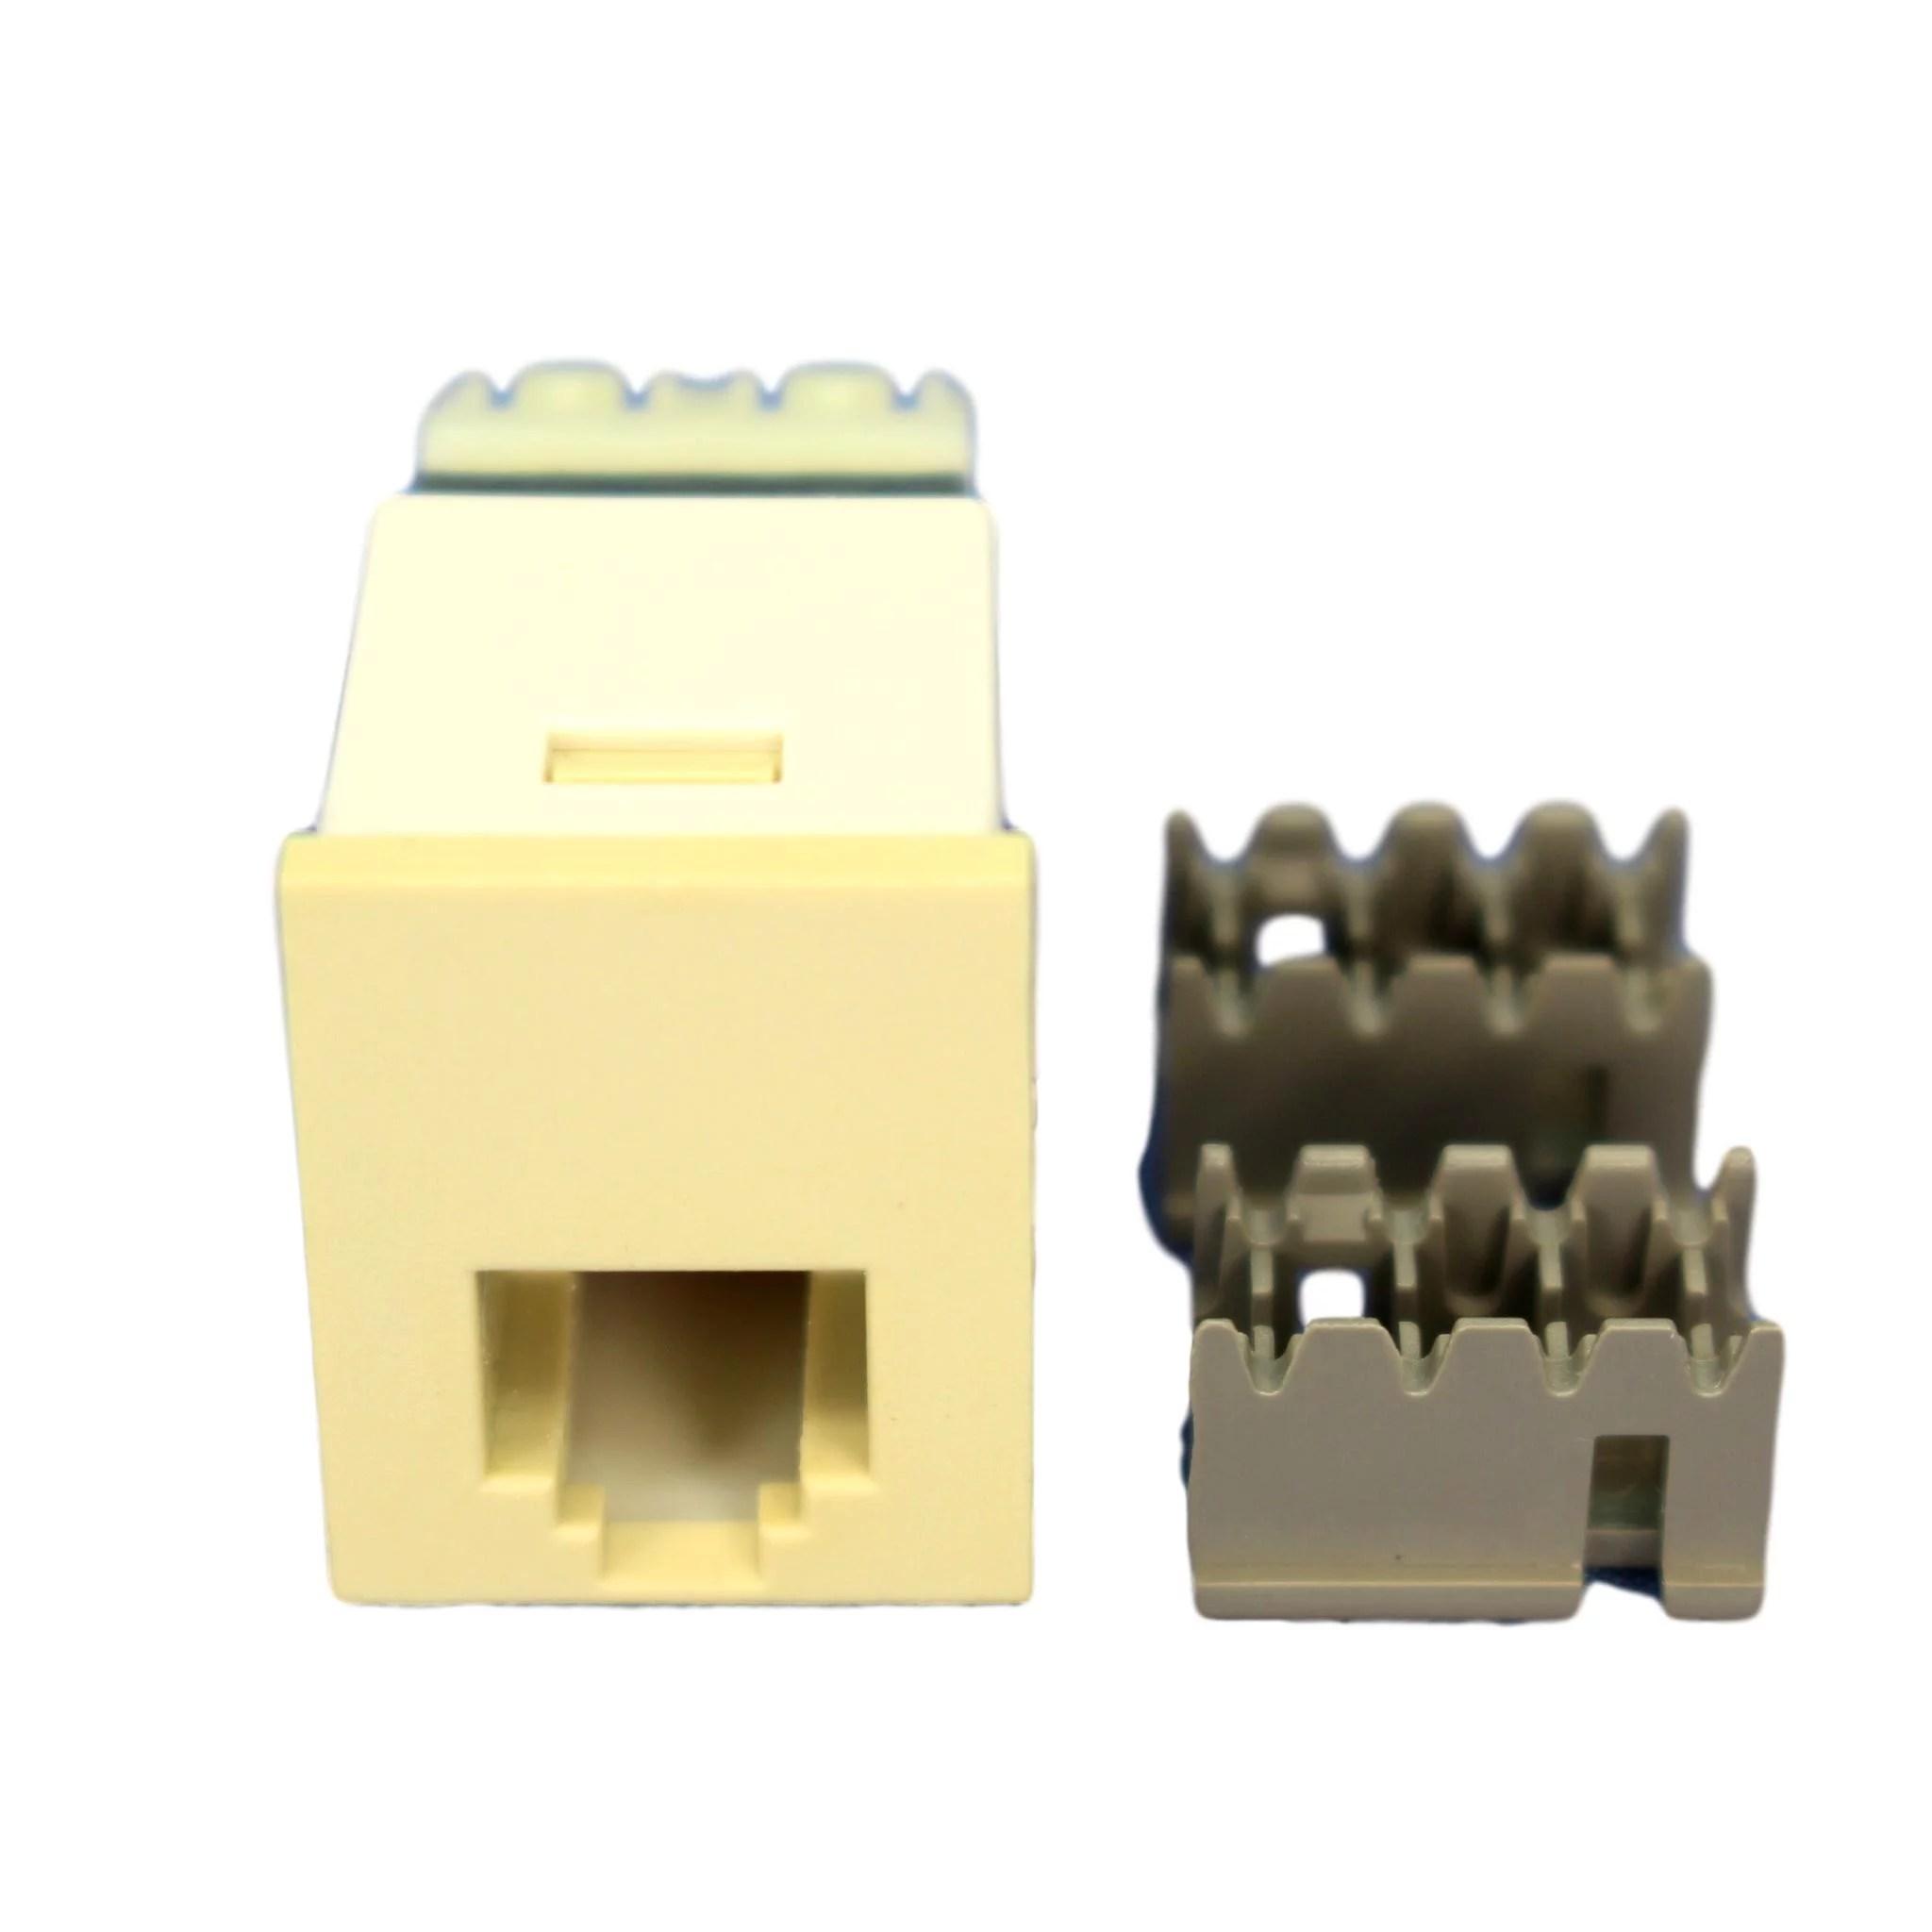 p s ivory smooth 6 wire phone jack rj25c telephone usoc wiring 6p 6c cat3 category 3 s6u i 6 wire phone jack wiring [ 2048 x 2048 Pixel ]